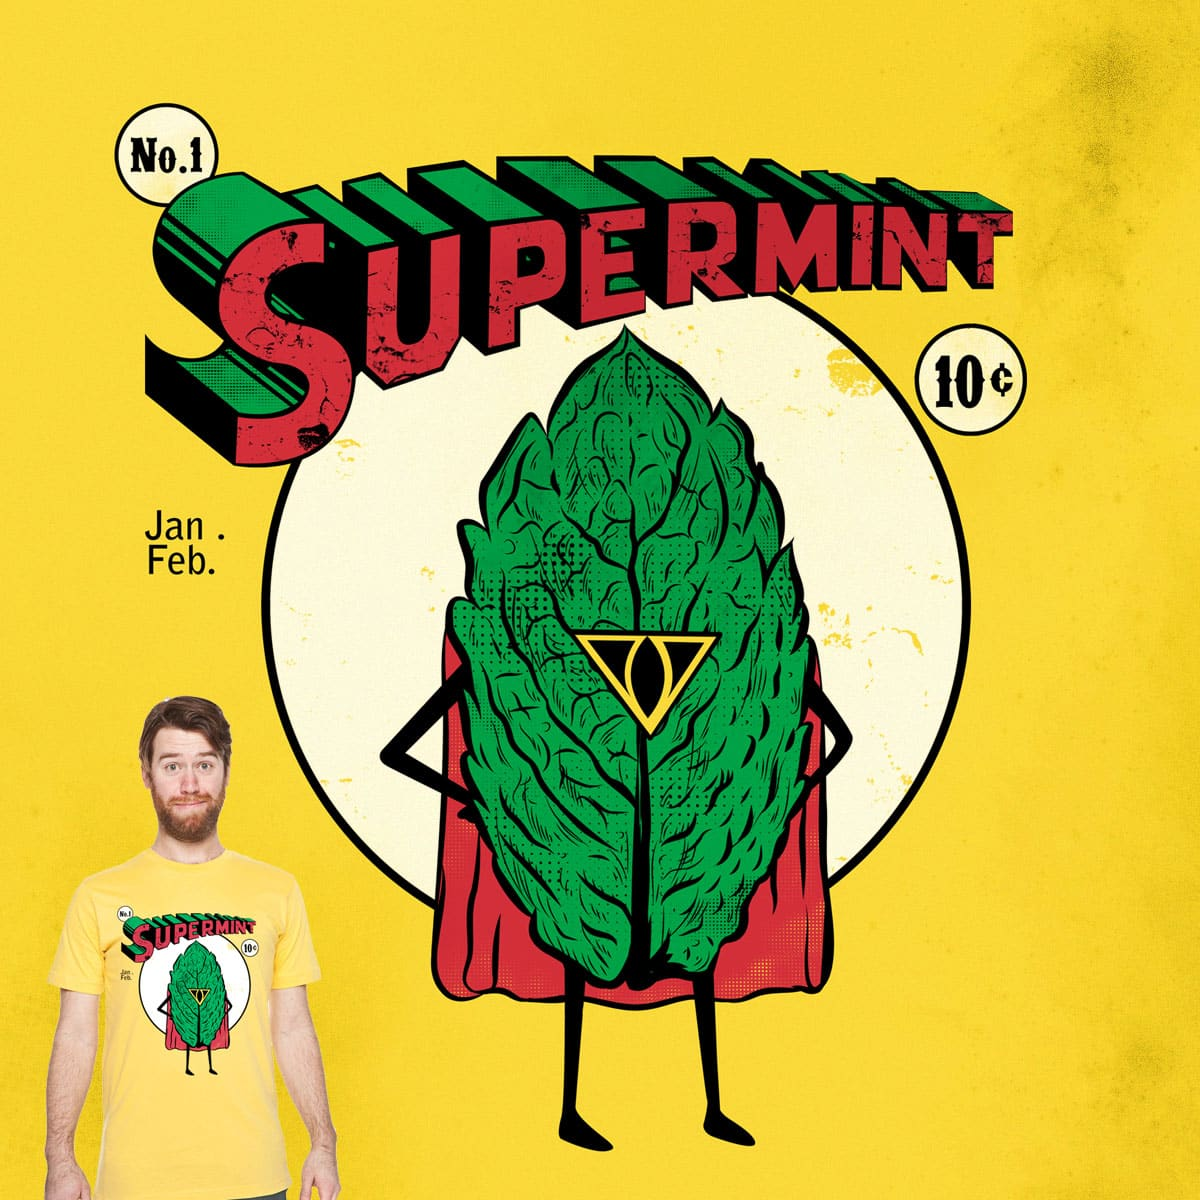 SUPERMINT by mainial on Threadless